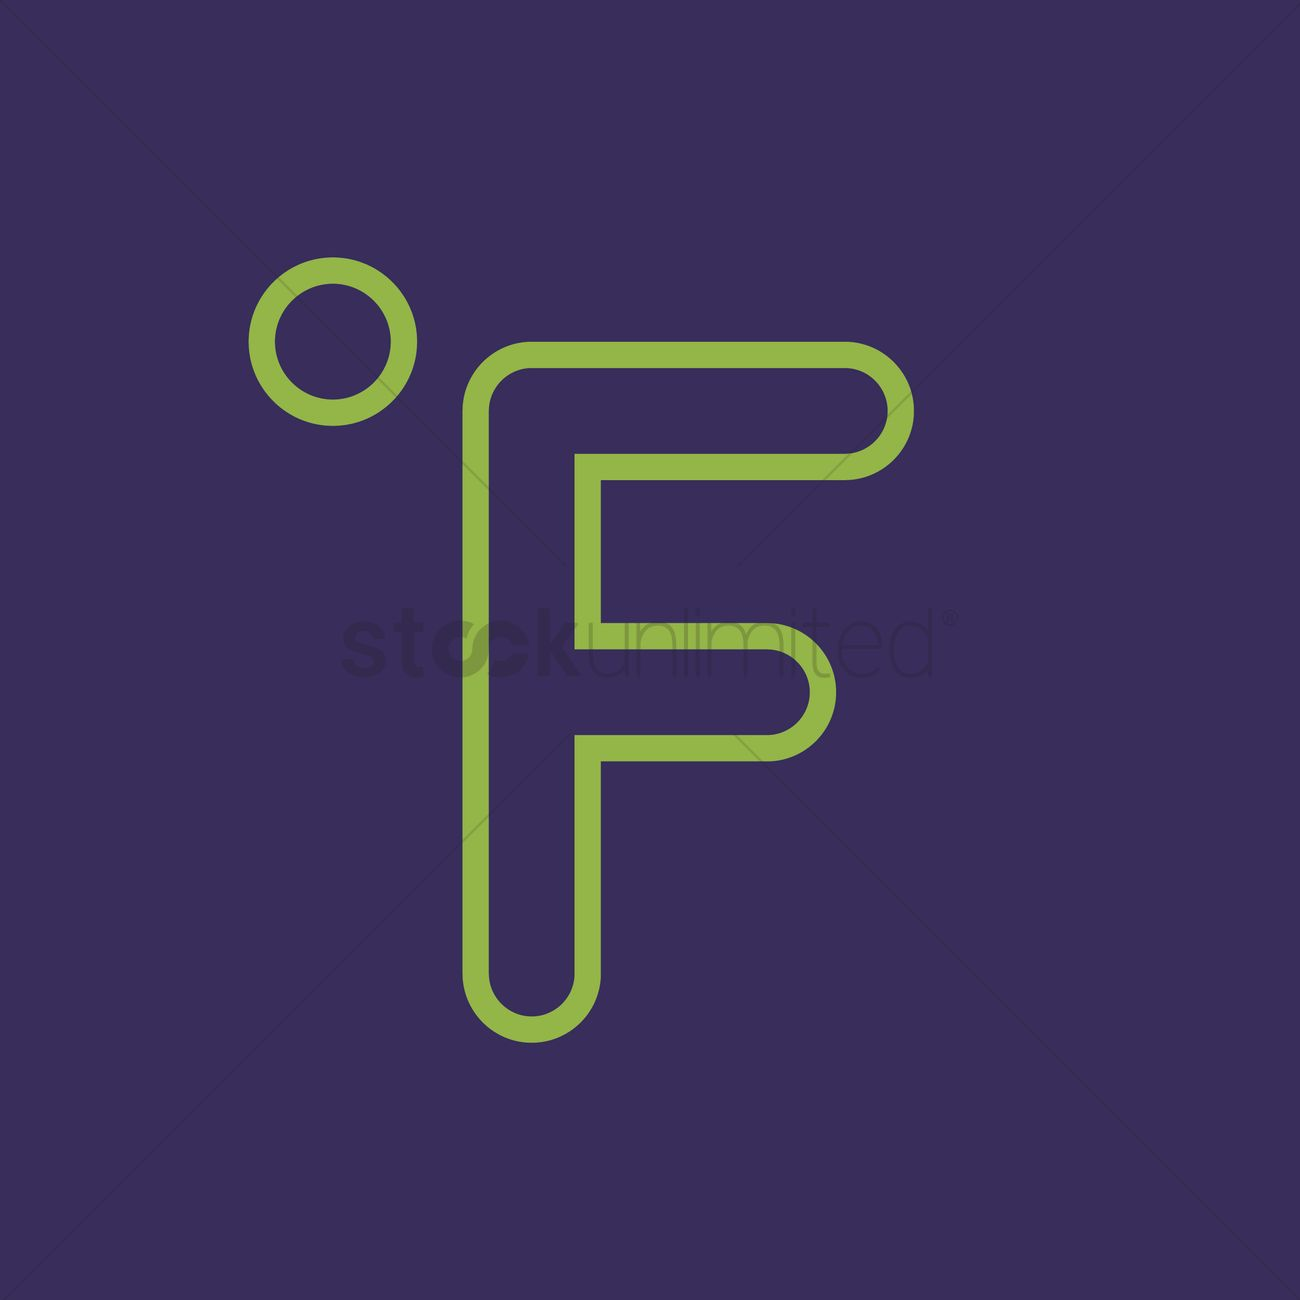 Fahrenheit symbol vector image 1370336 stockunlimited fahrenheit symbol vector graphic biocorpaavc Choice Image